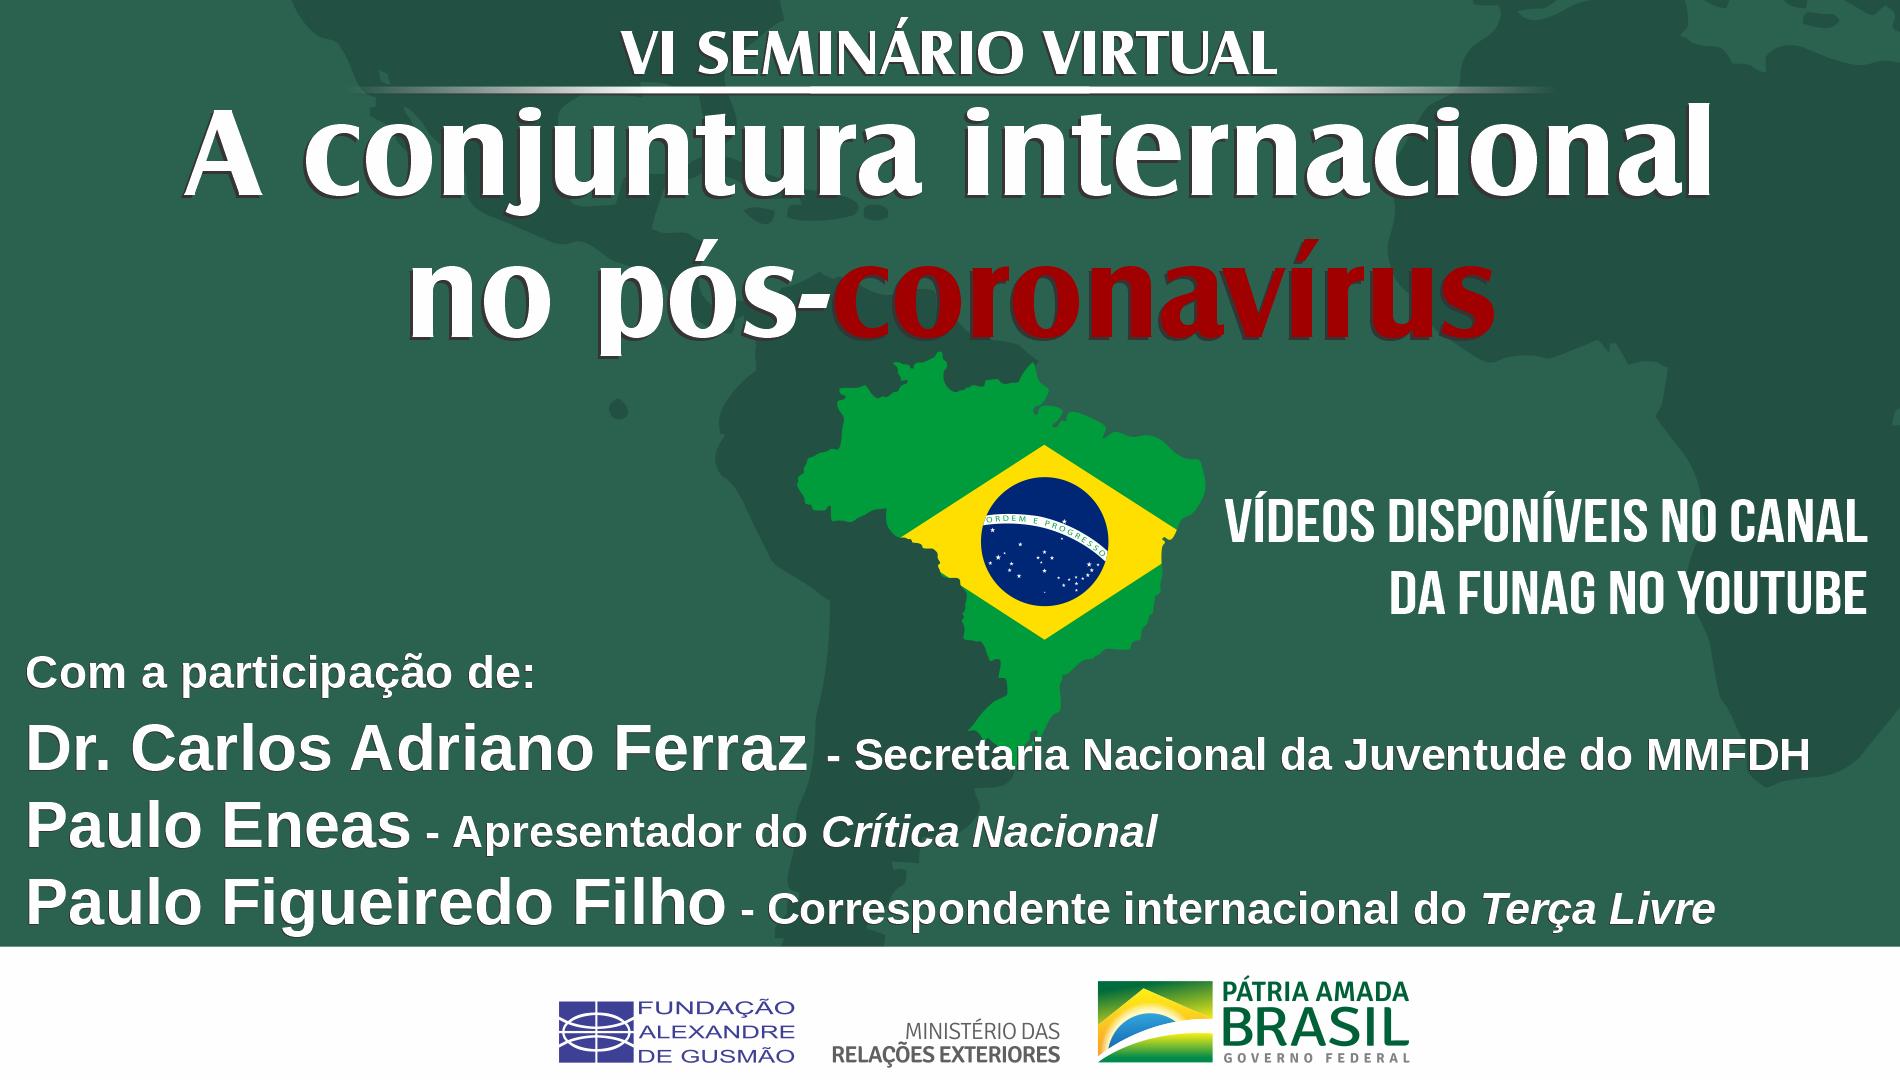 Assista aos vídeos do VI seminário virtual sobre a conjuntura internacional no pós-coronavírus